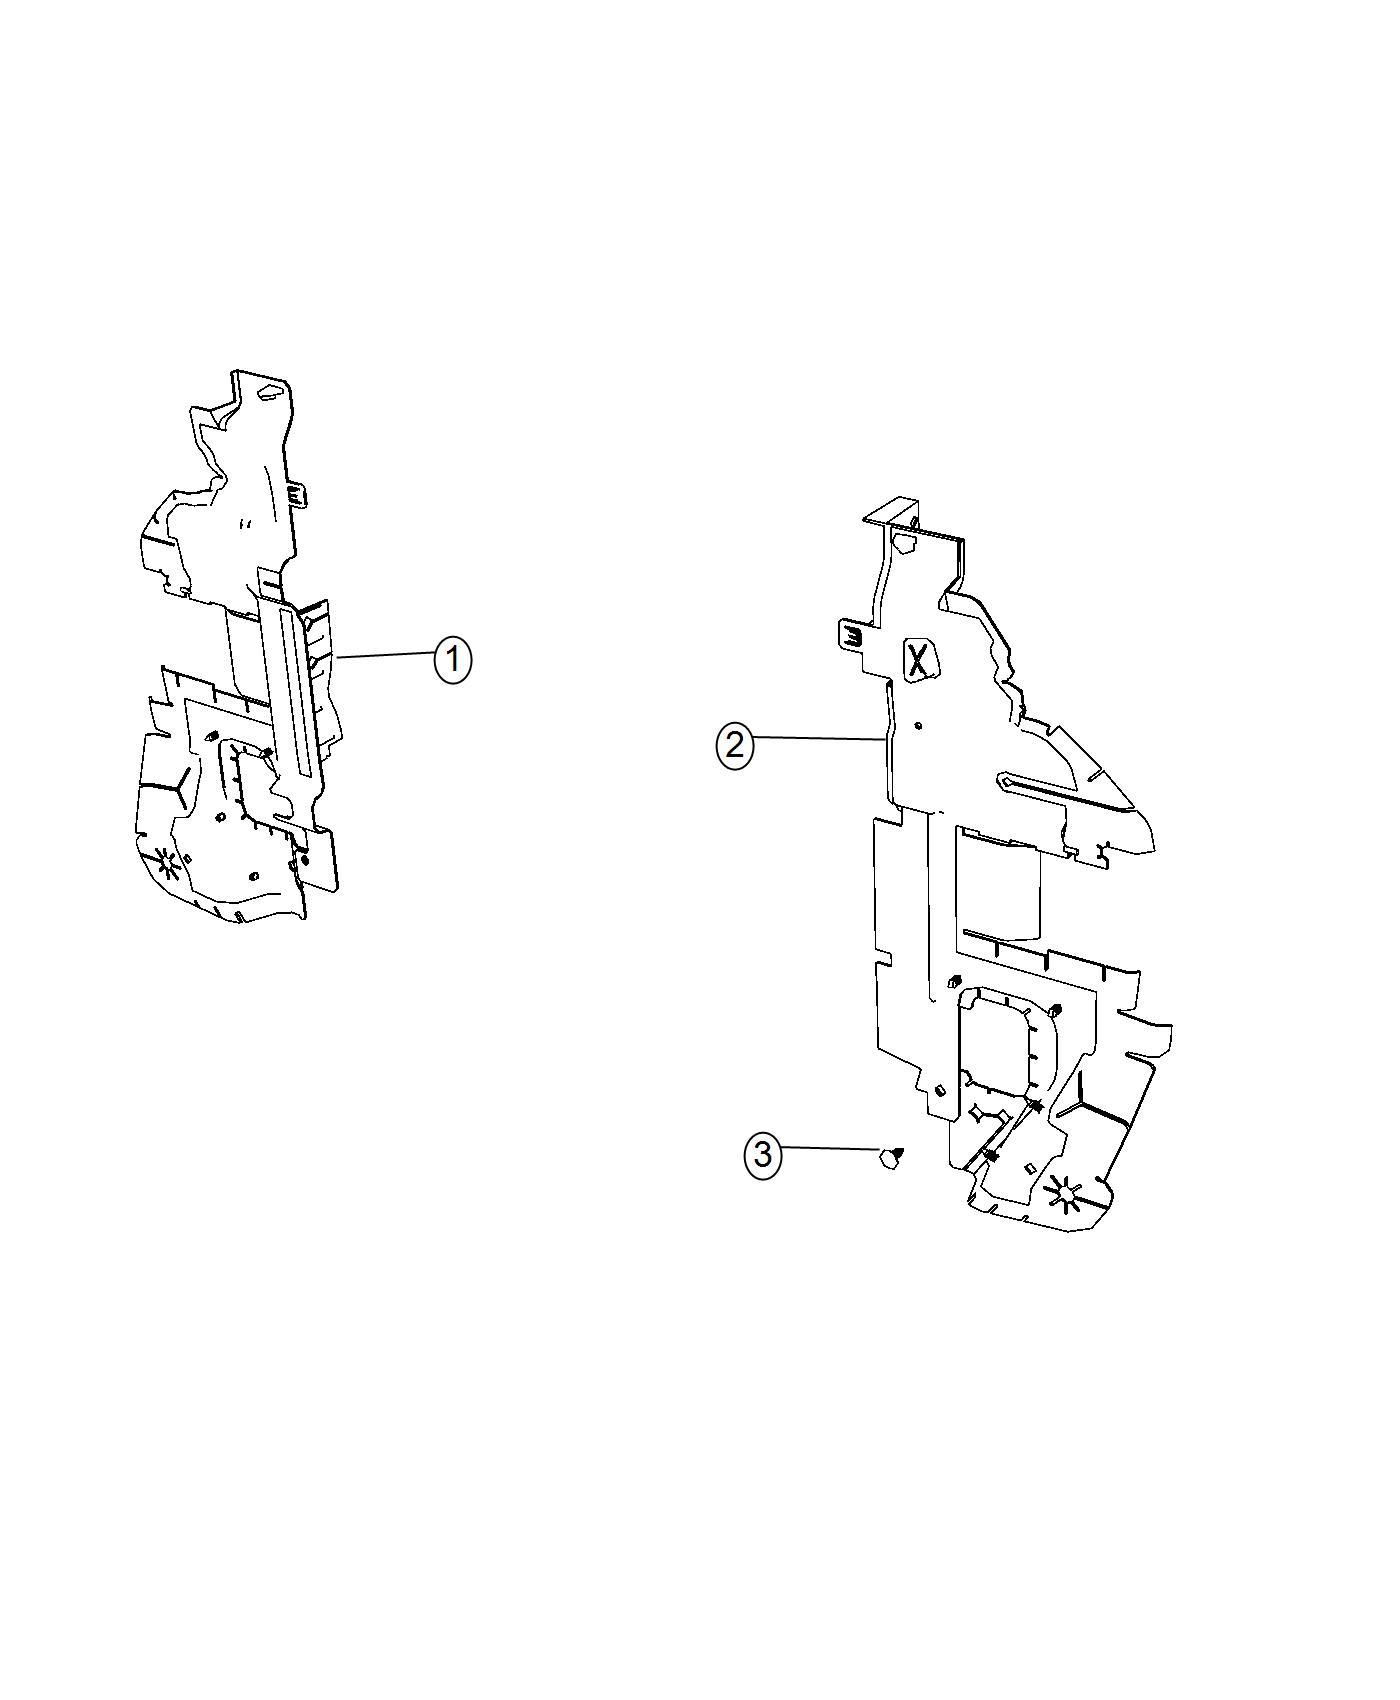 2017 Dodge Journey Seal, shield. Radiator side air, side